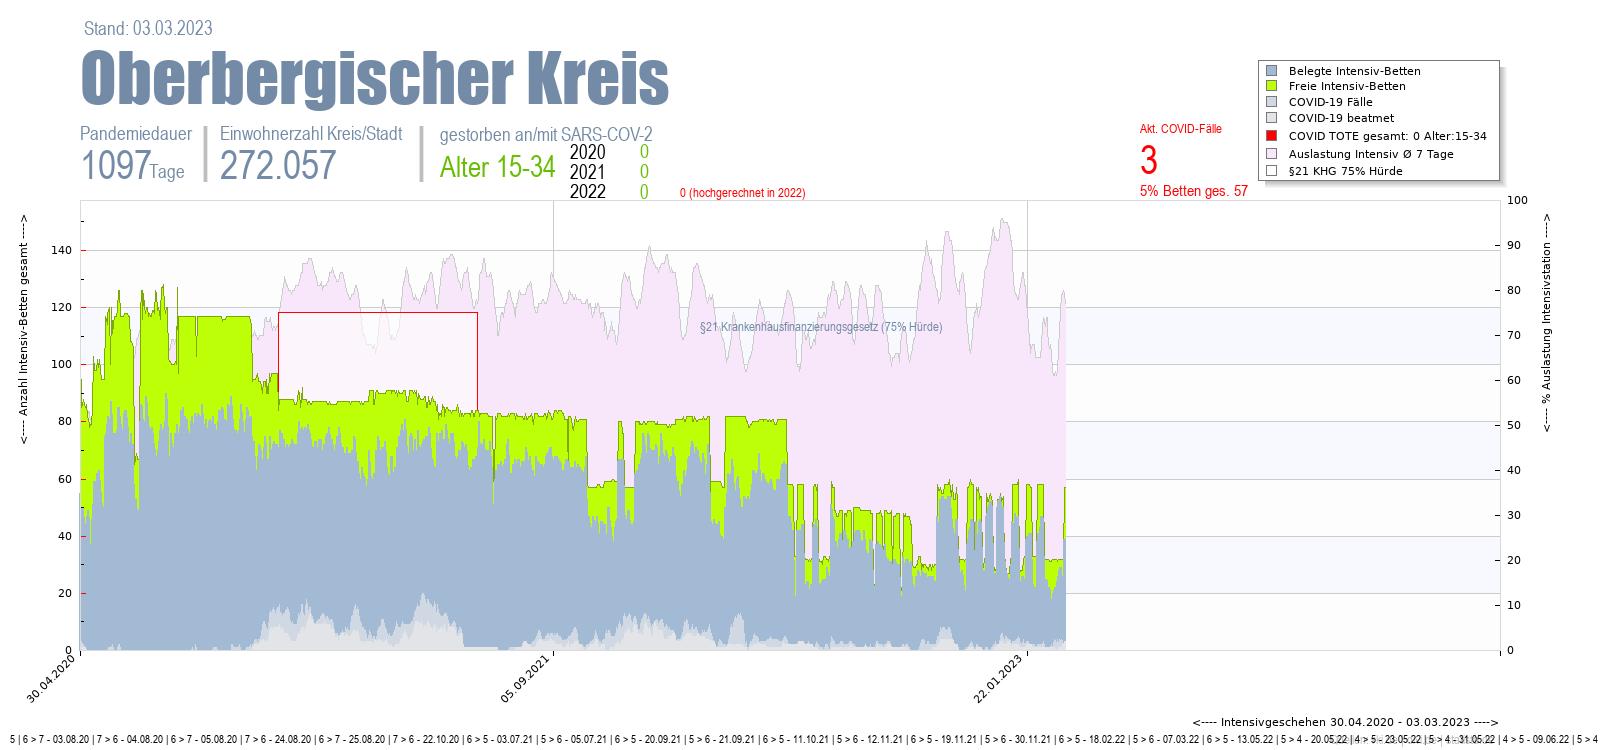 Intensivstation Auslastung Oberbergischer Kreis Alter 0-4